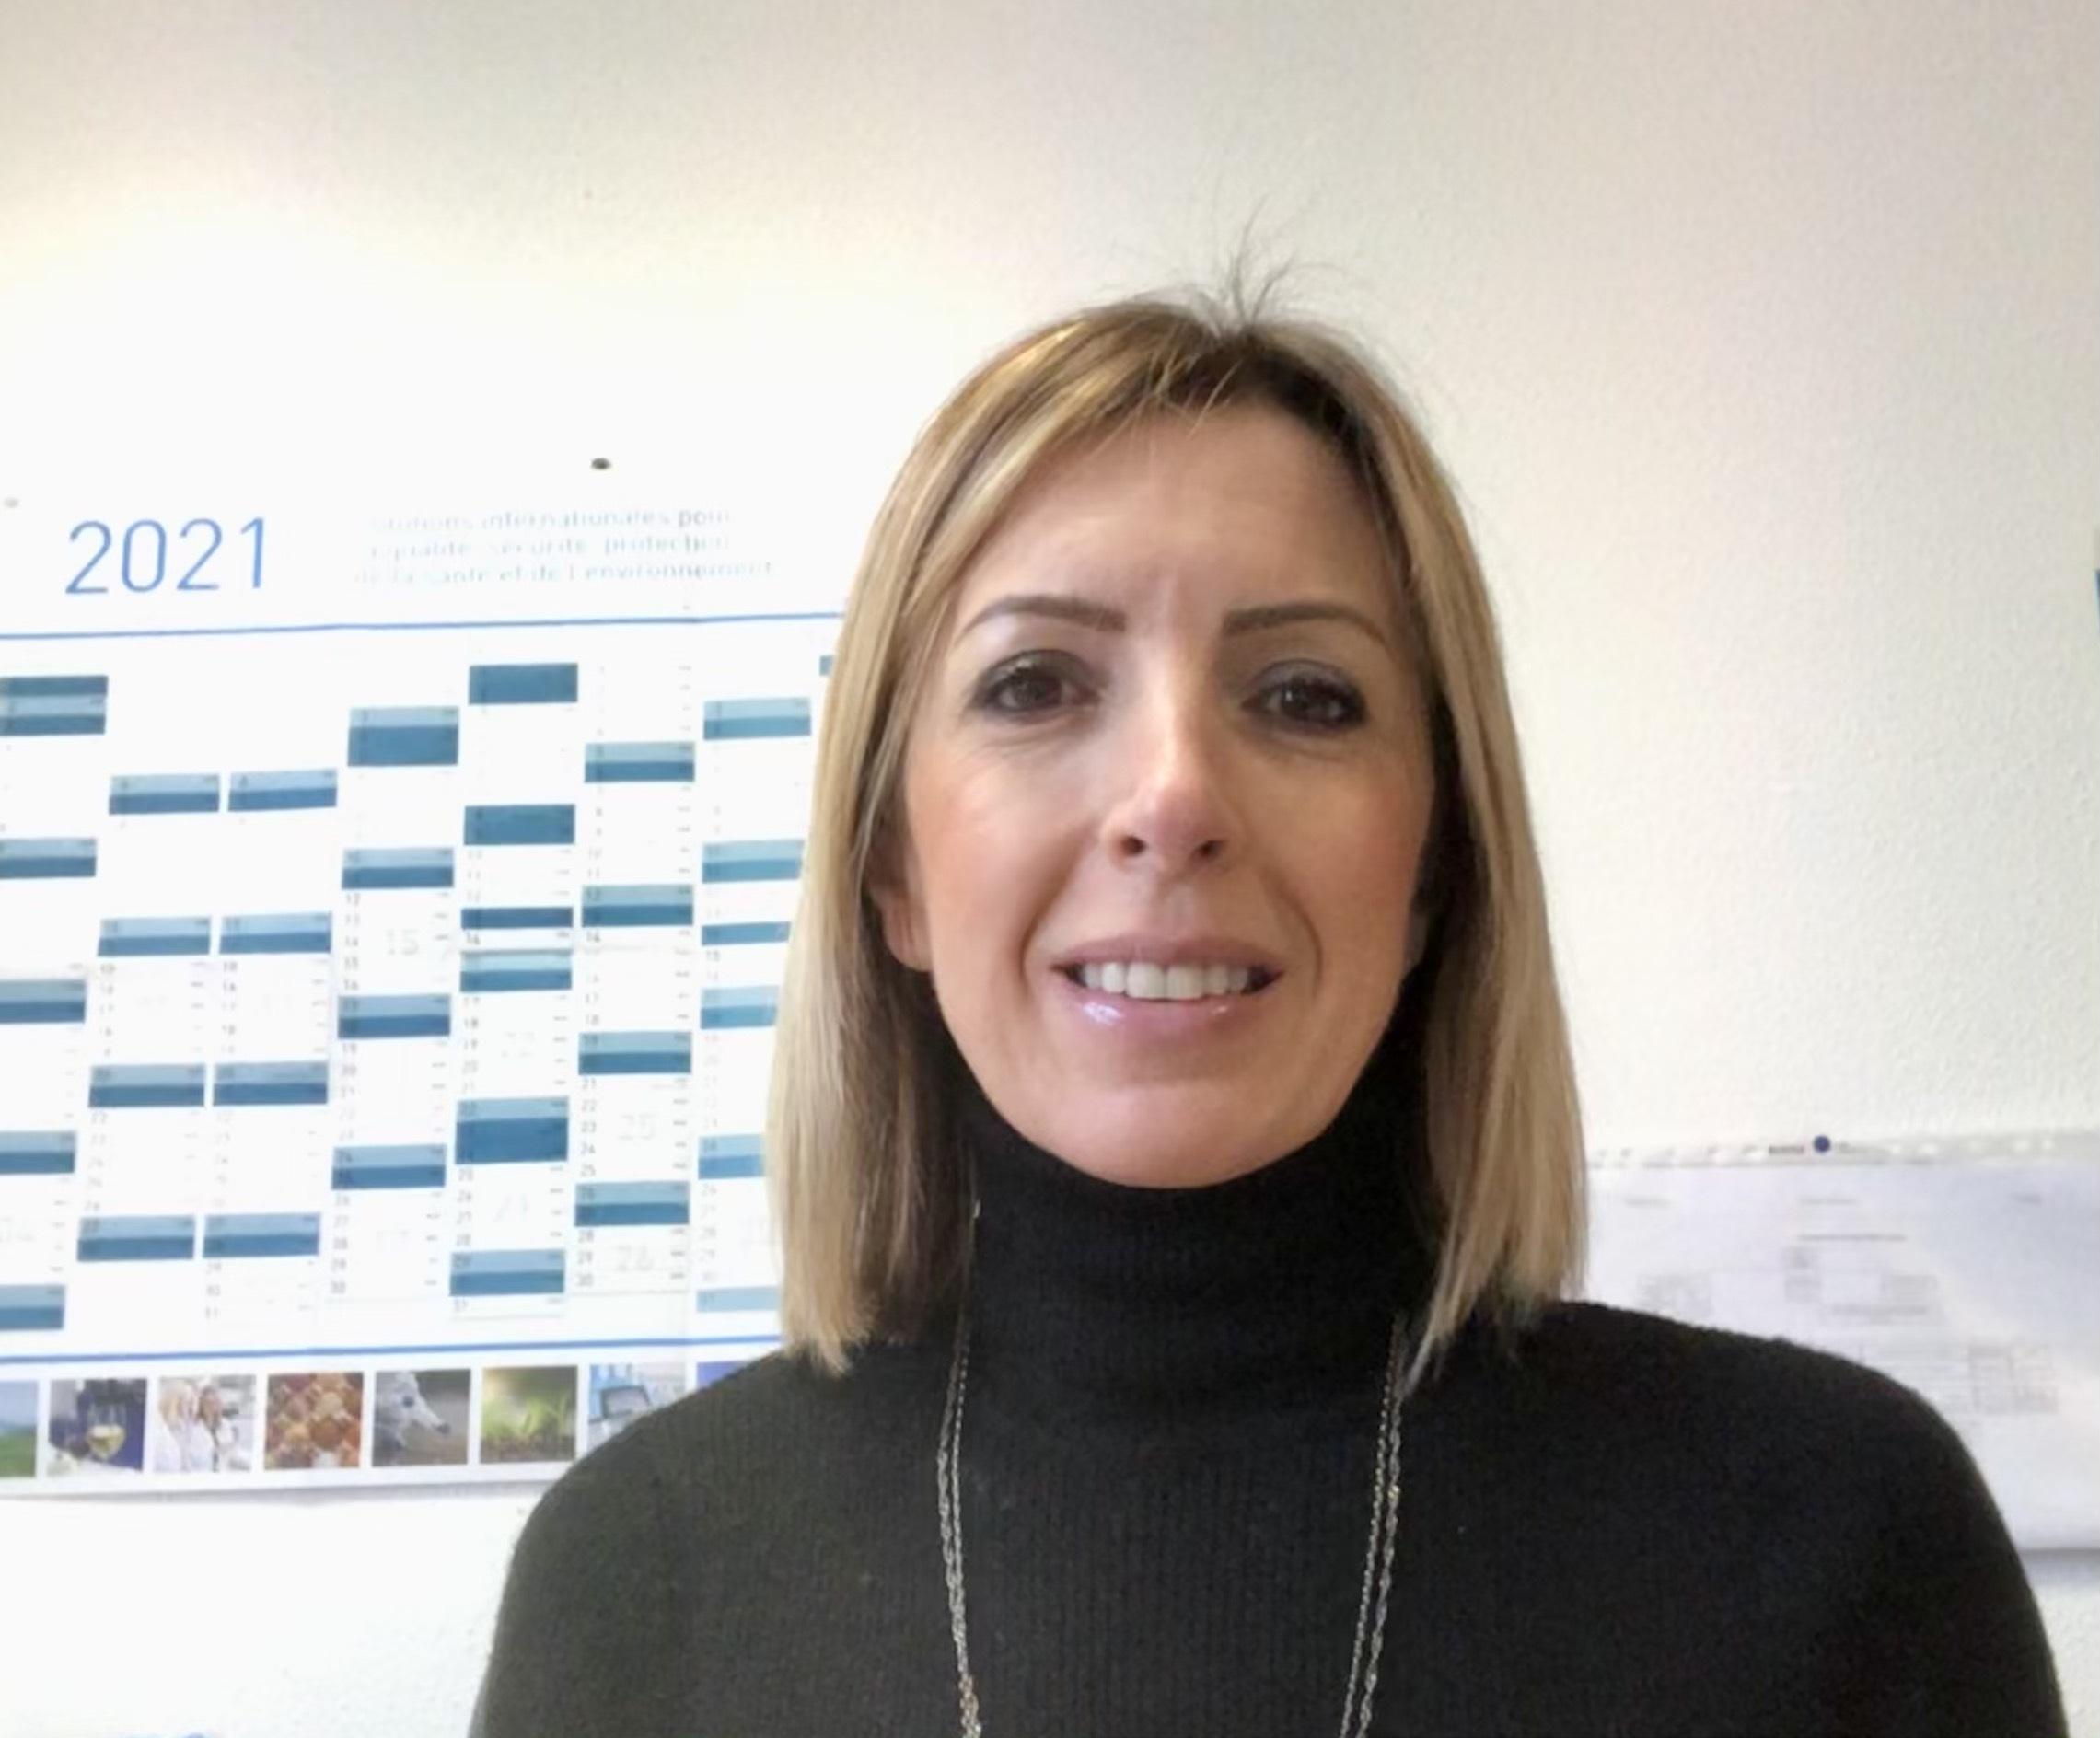 Elisabeth Jouffray, Directrice des Ressources Humaines chez WESSLING France,